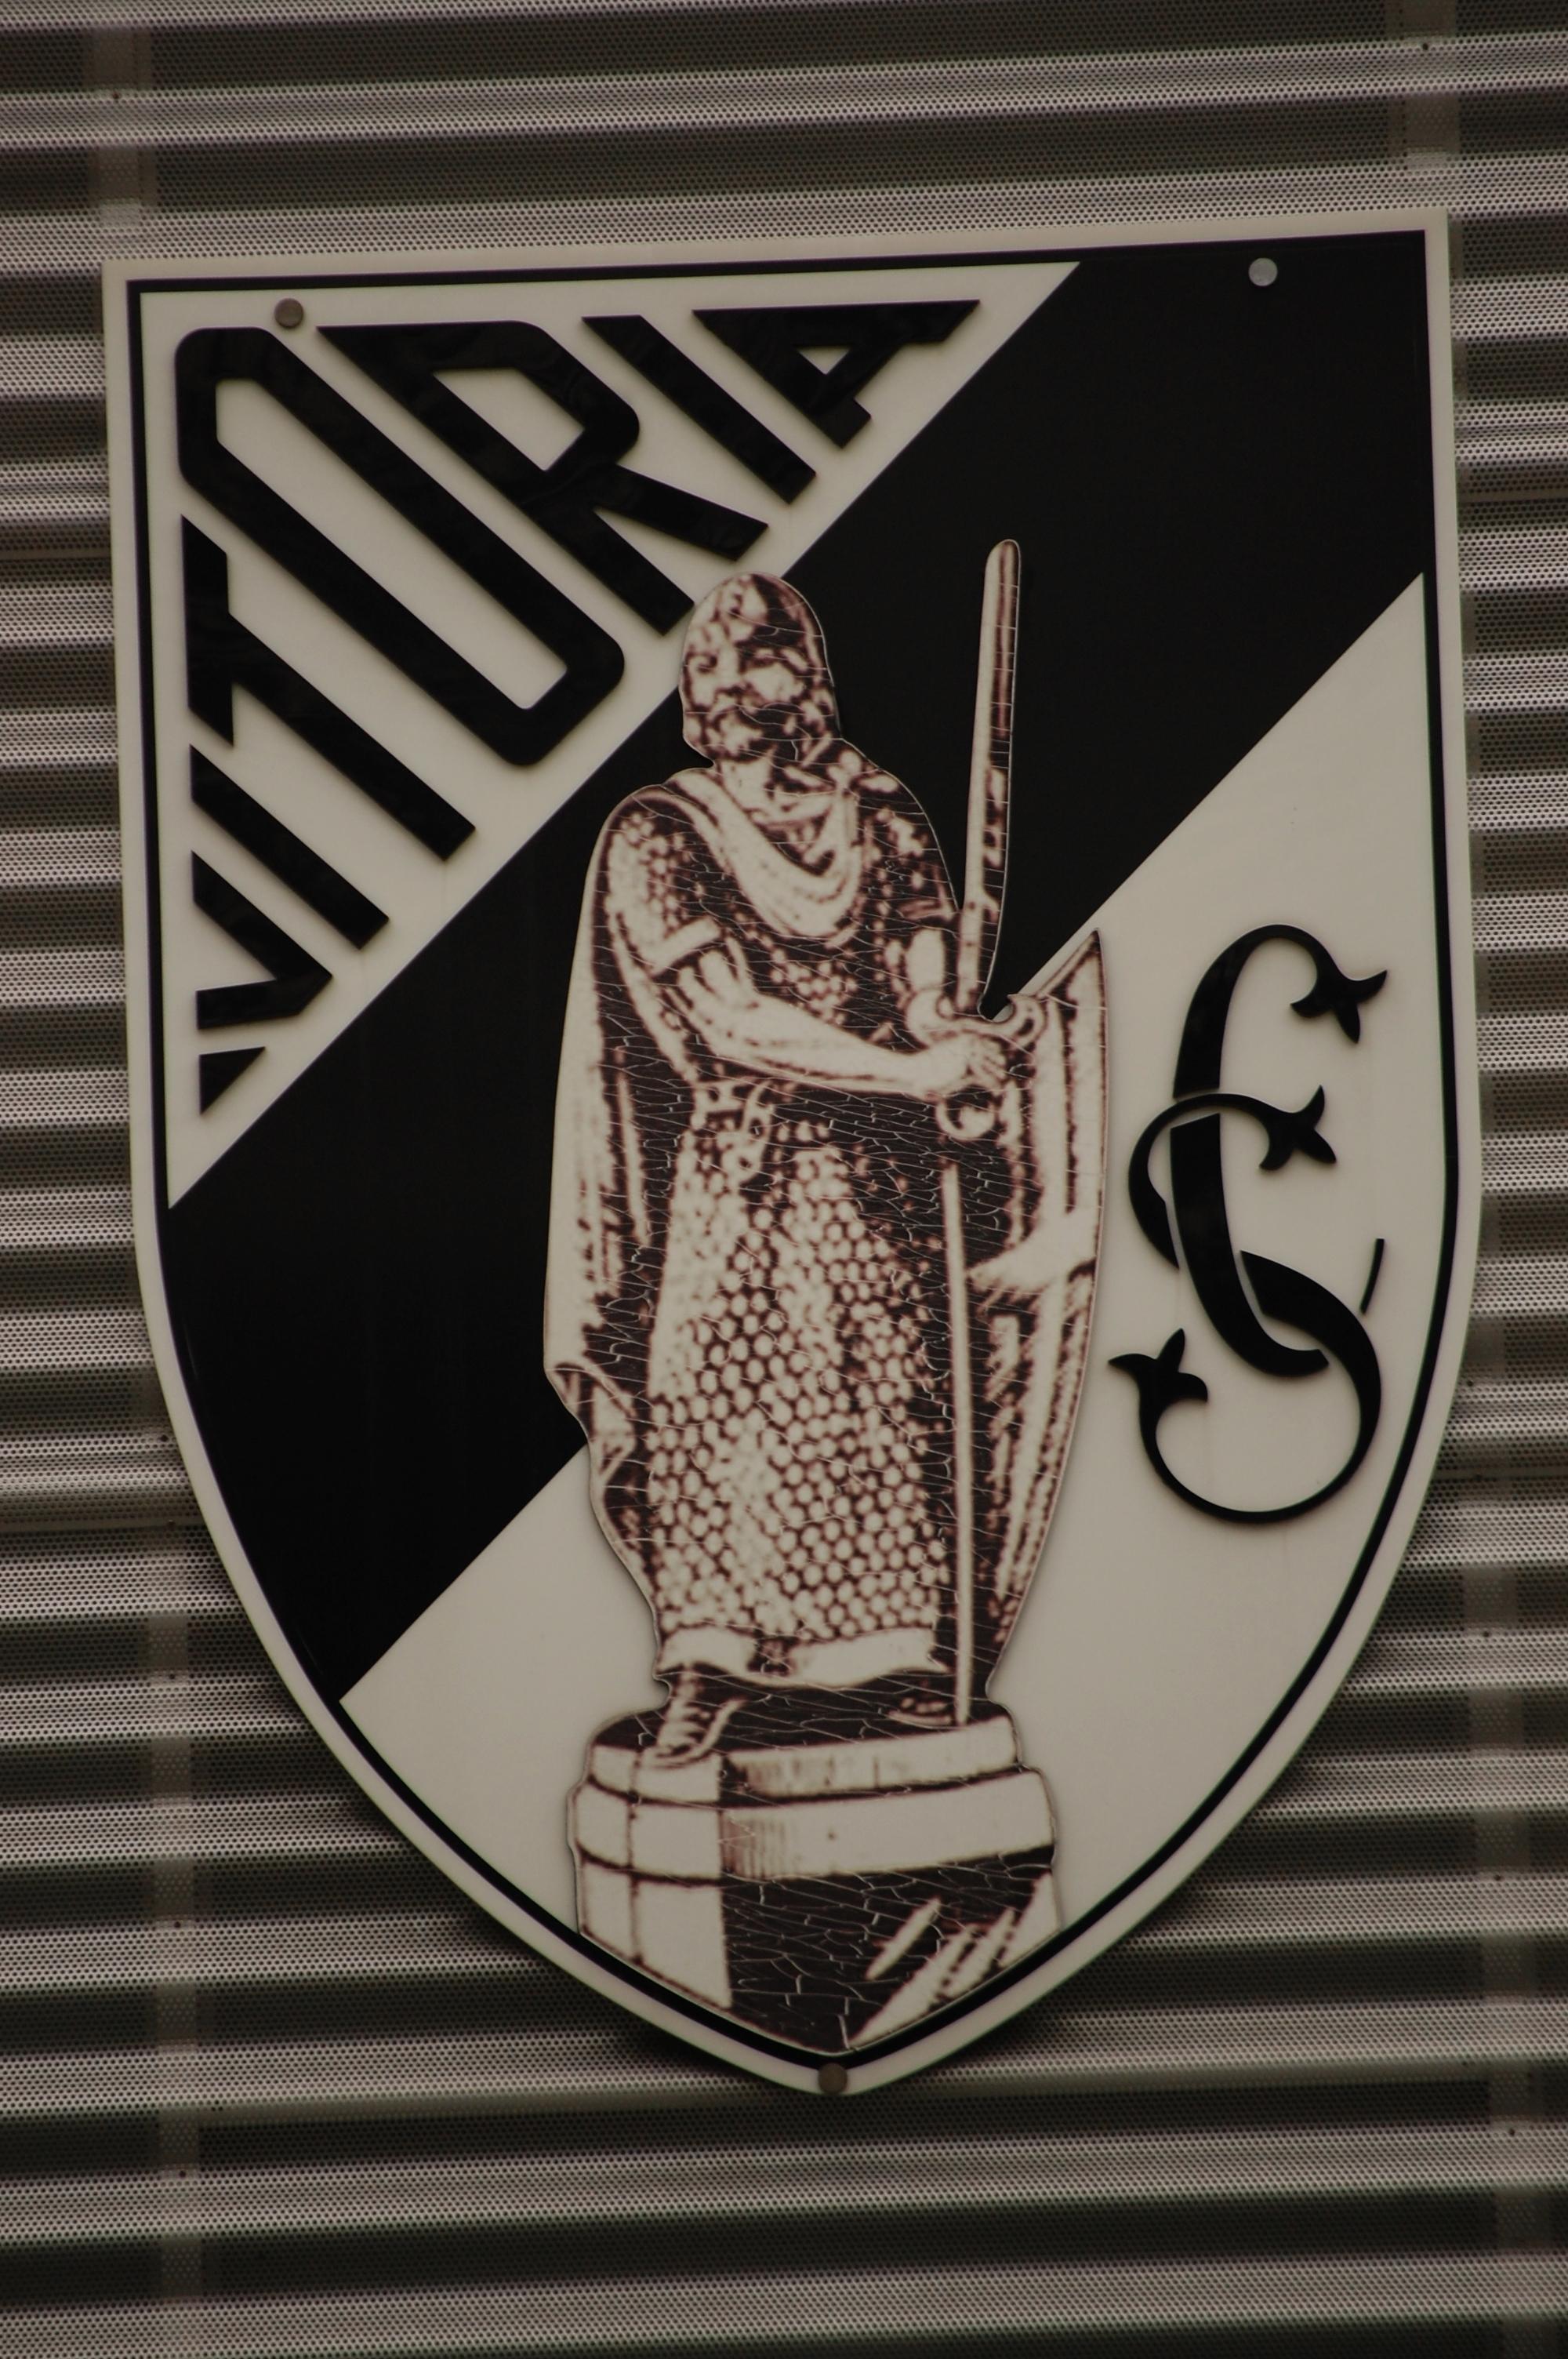 File Logo do Vitória Sport Club no Estádio D. Afonso Henriques.JPG ... 7615c5f9772aa